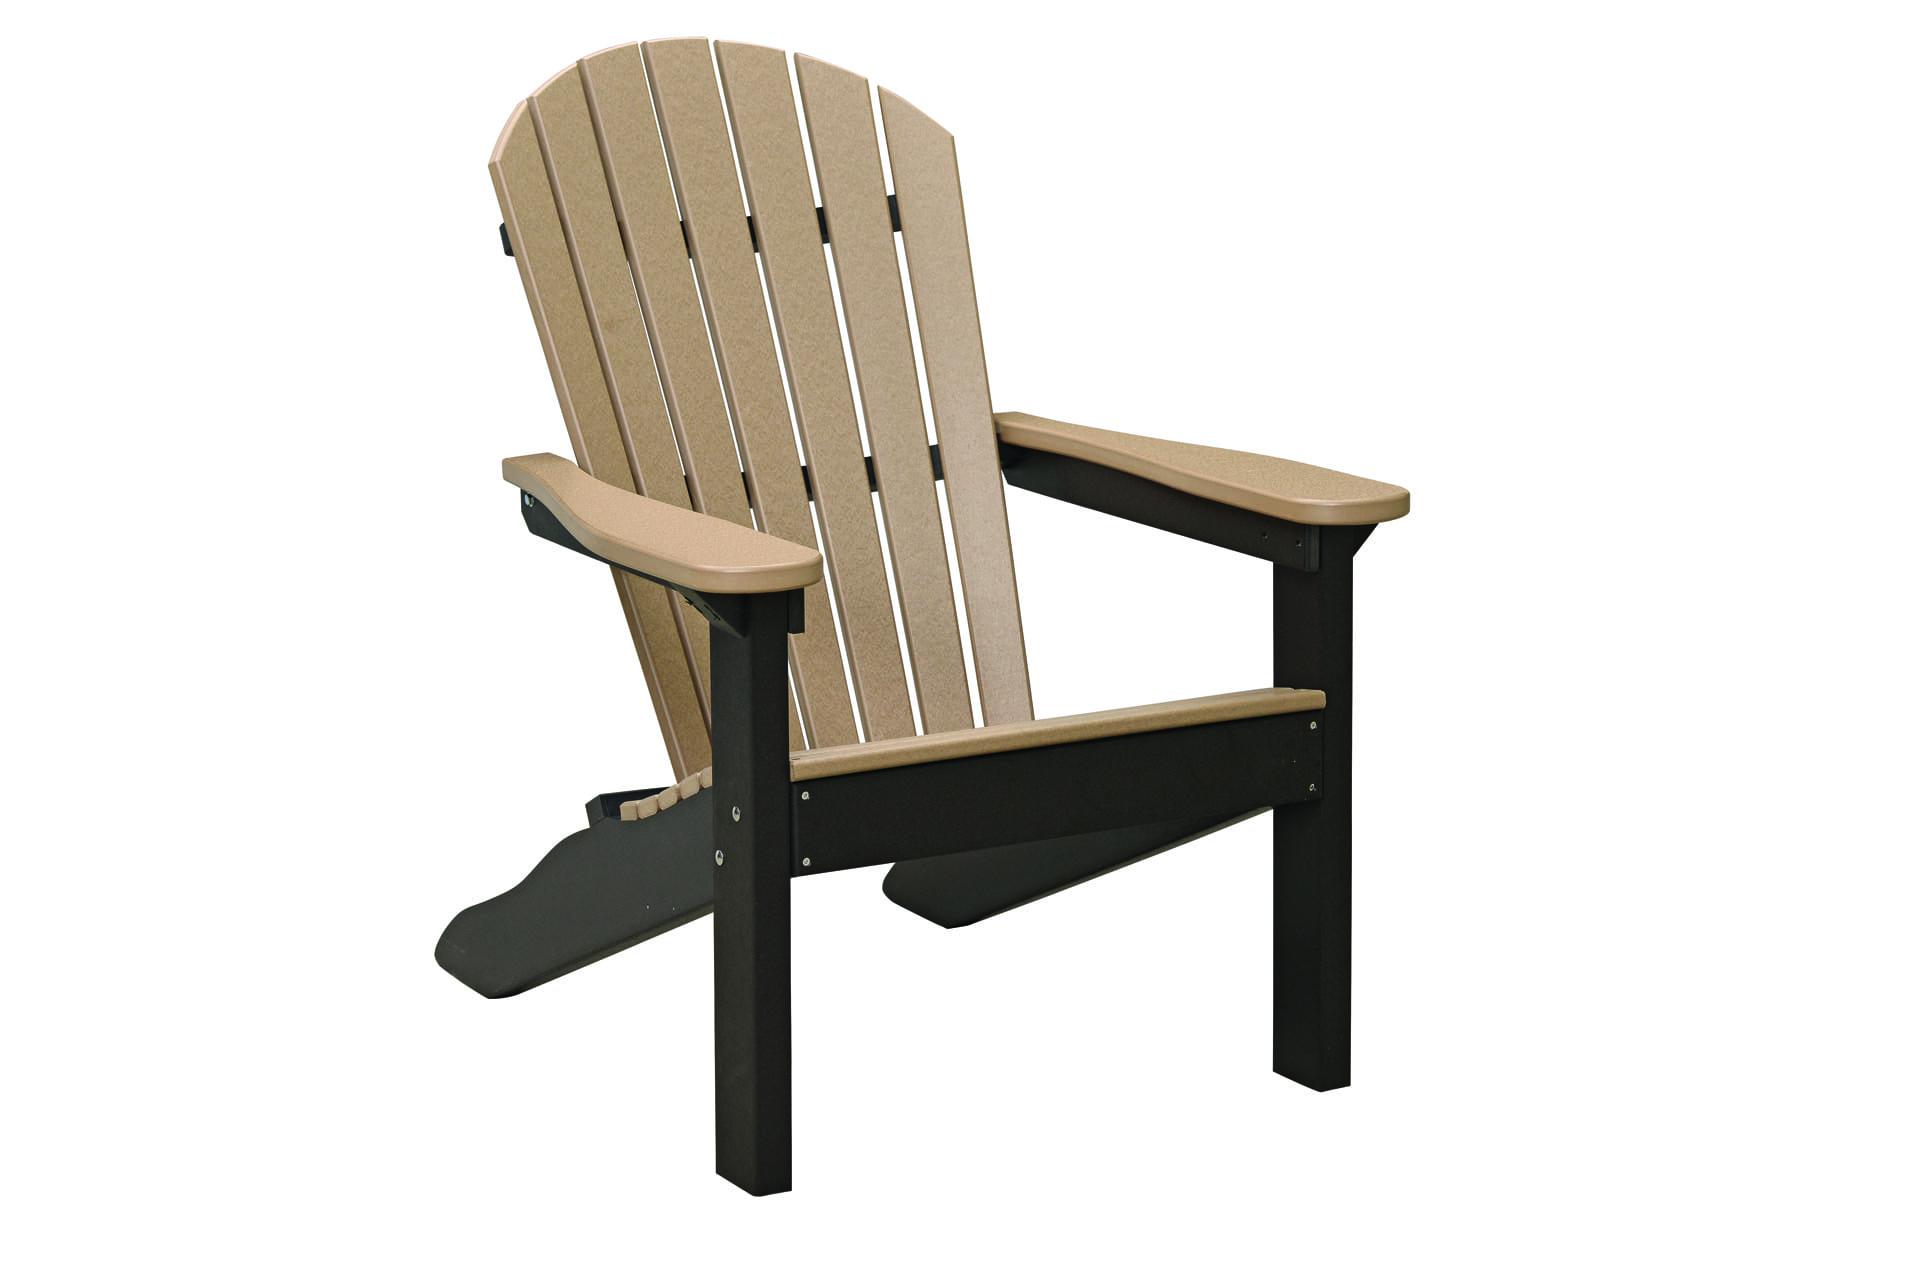 michigan adirondack chair banana lounge bunnings jim 39s amish structures